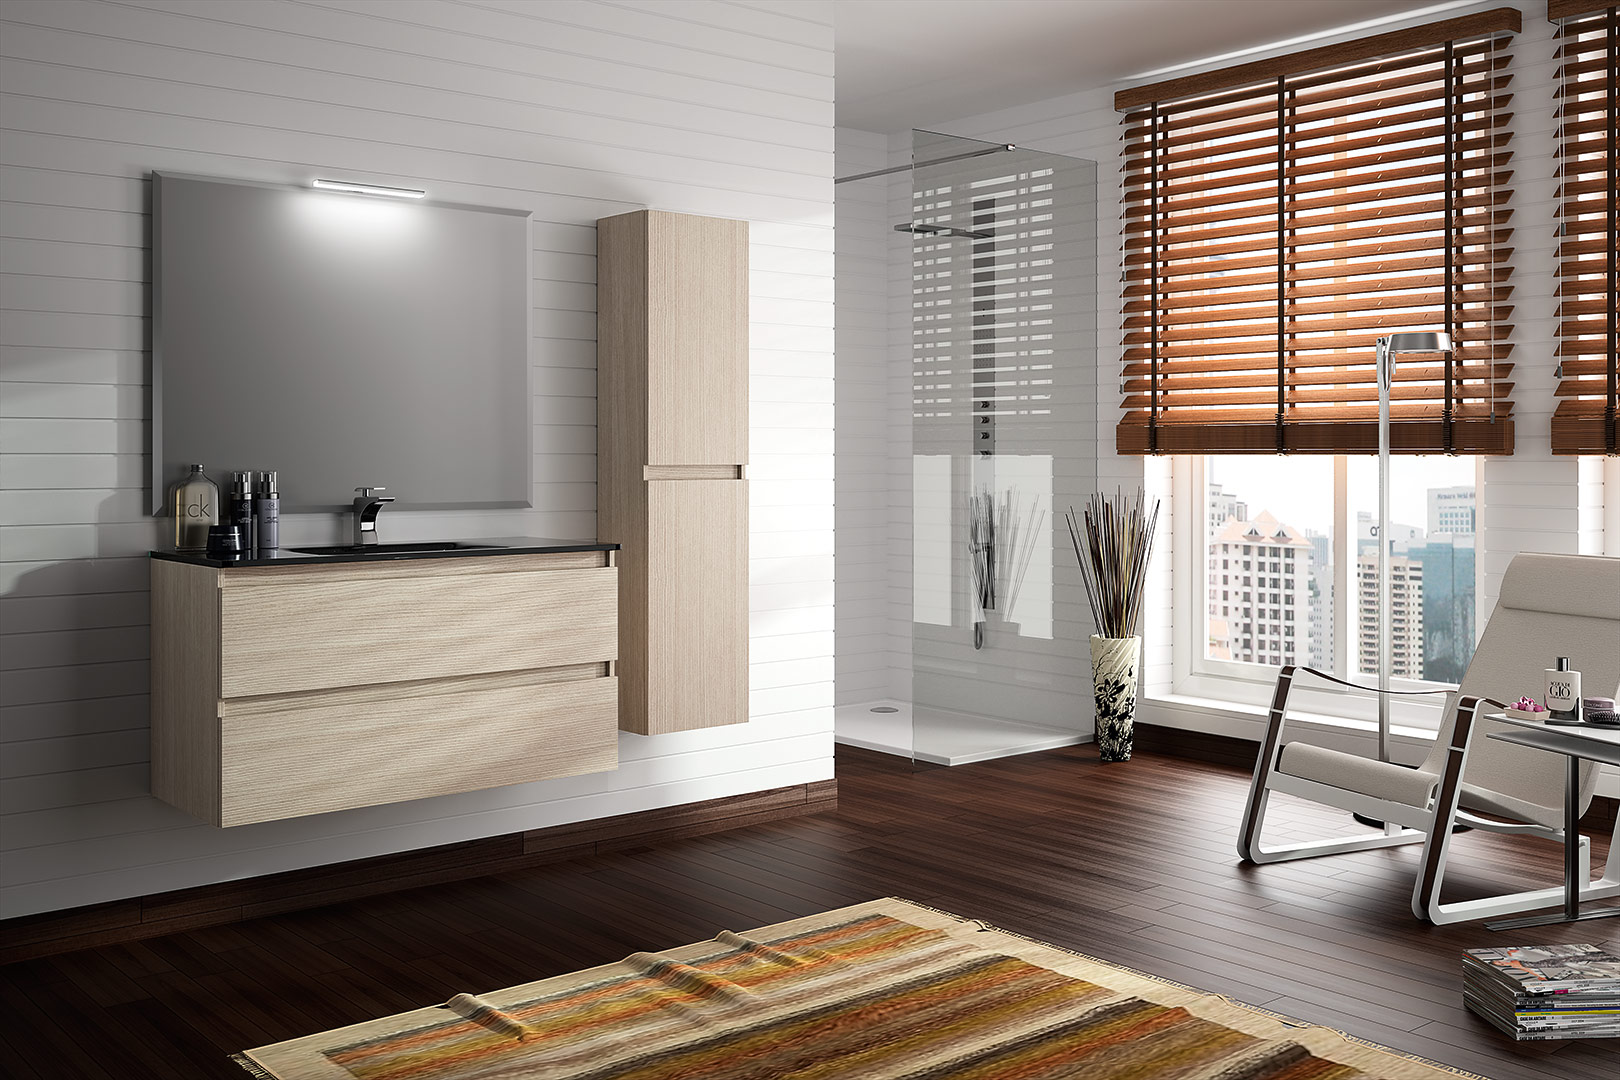 Comprar muebles de ba o online modernos de dise o for Muebles de bano modernos online